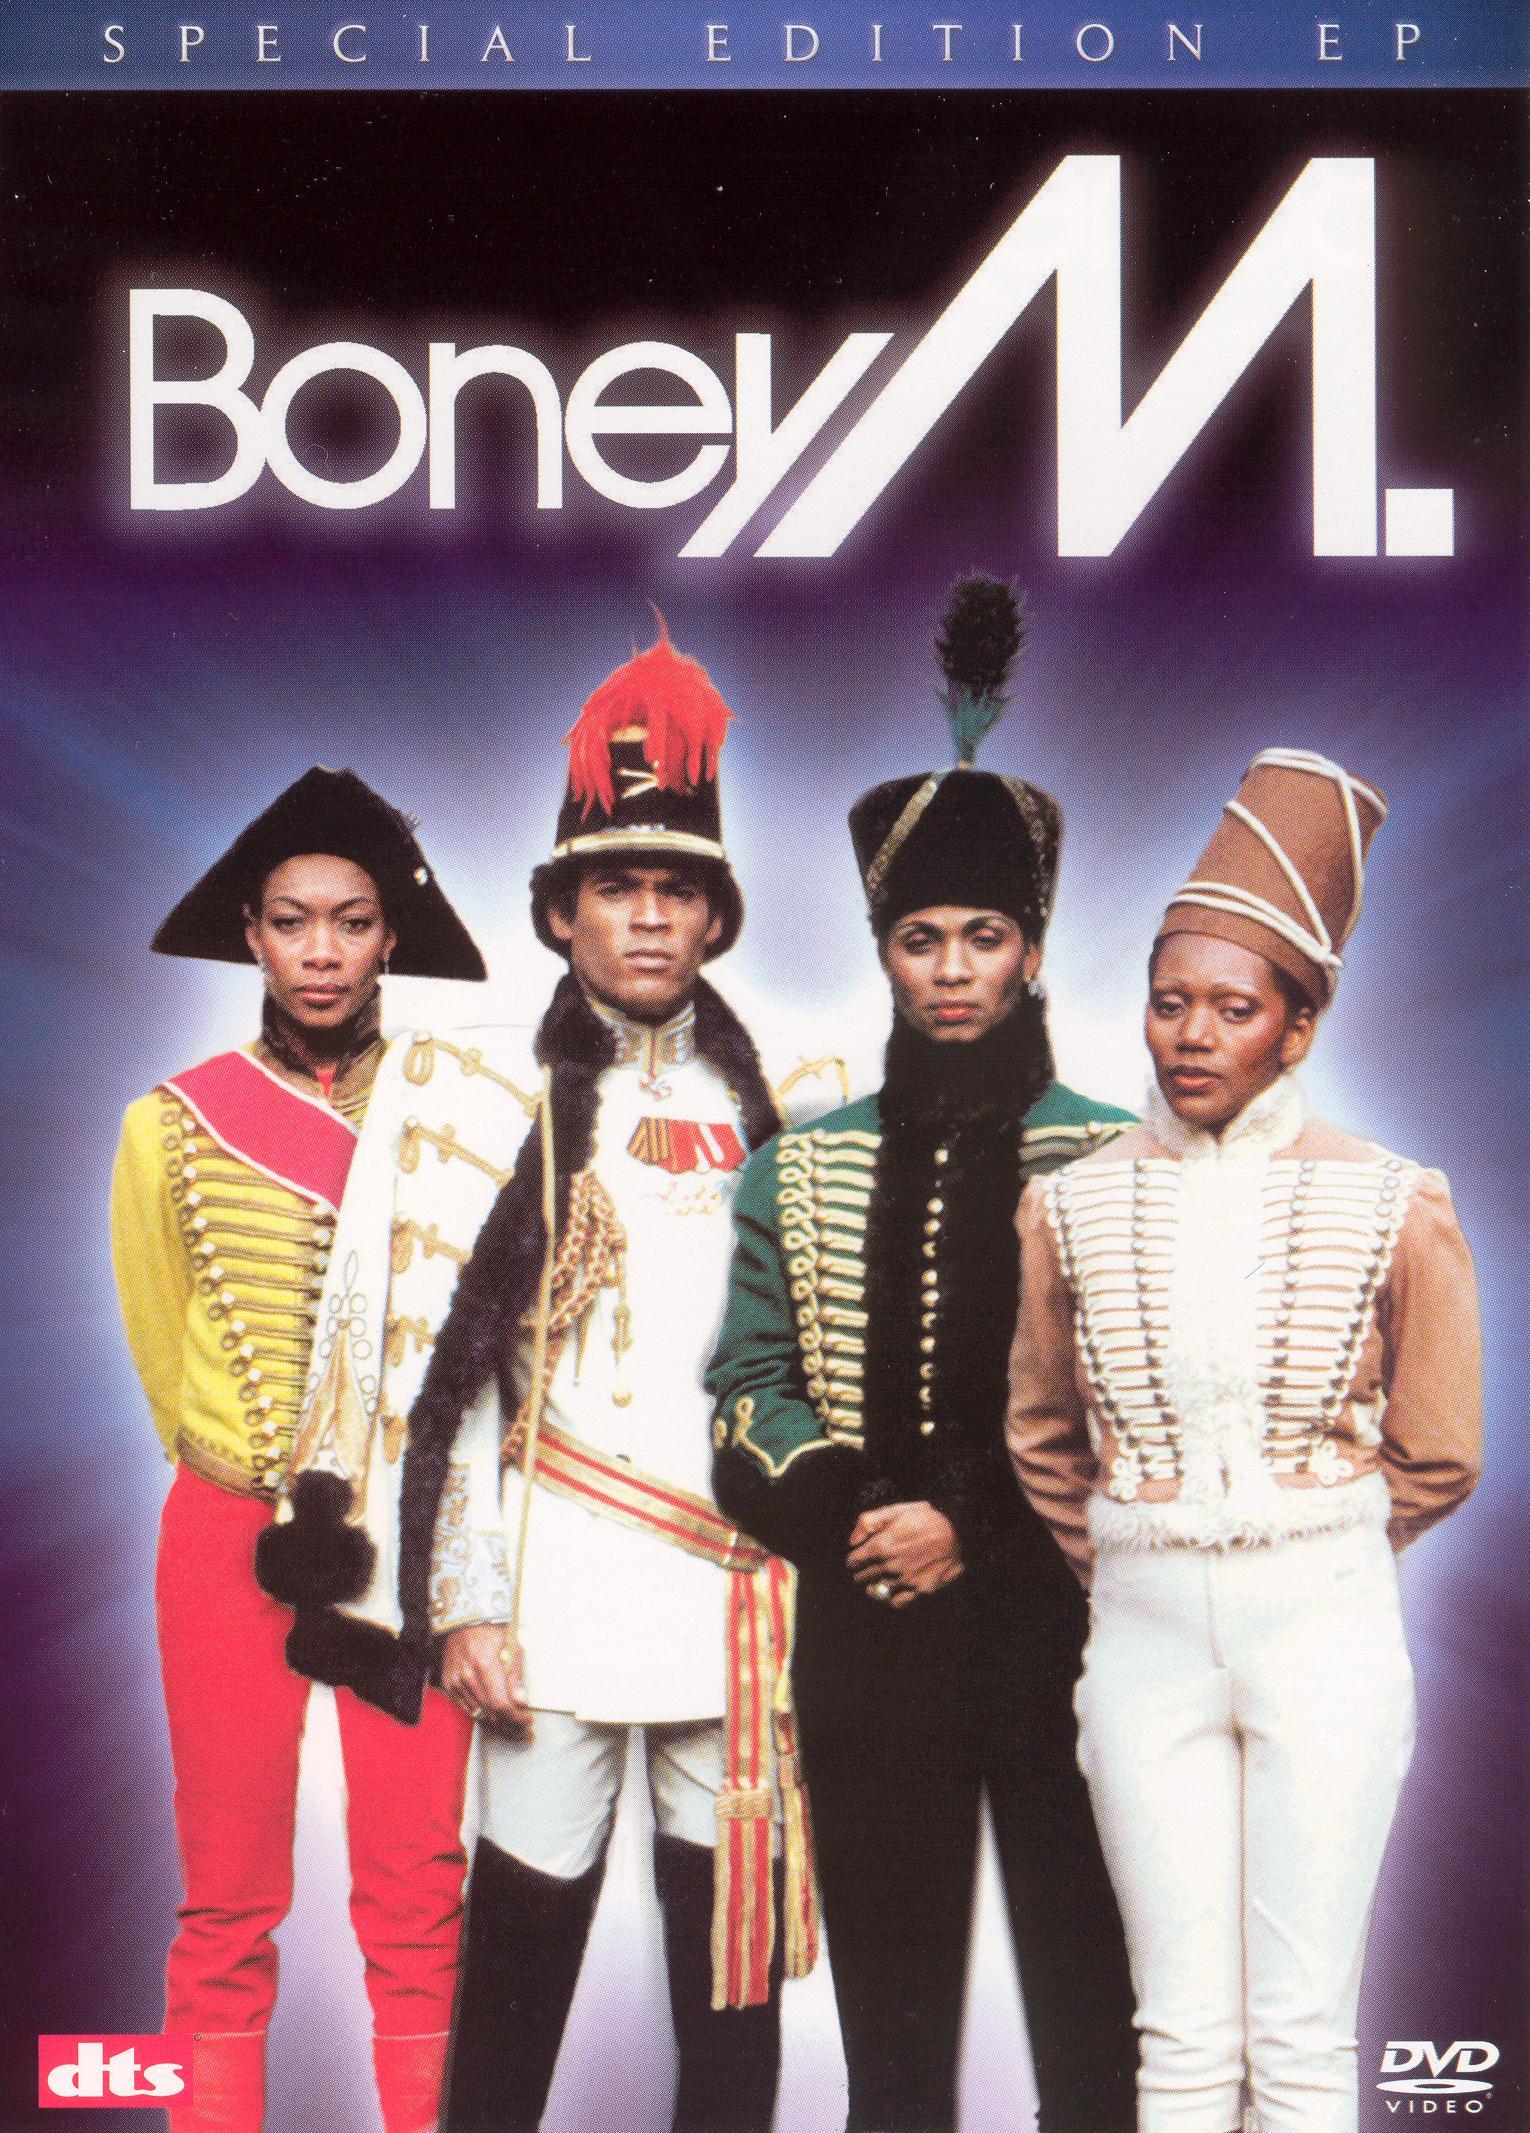 Boney M. EP